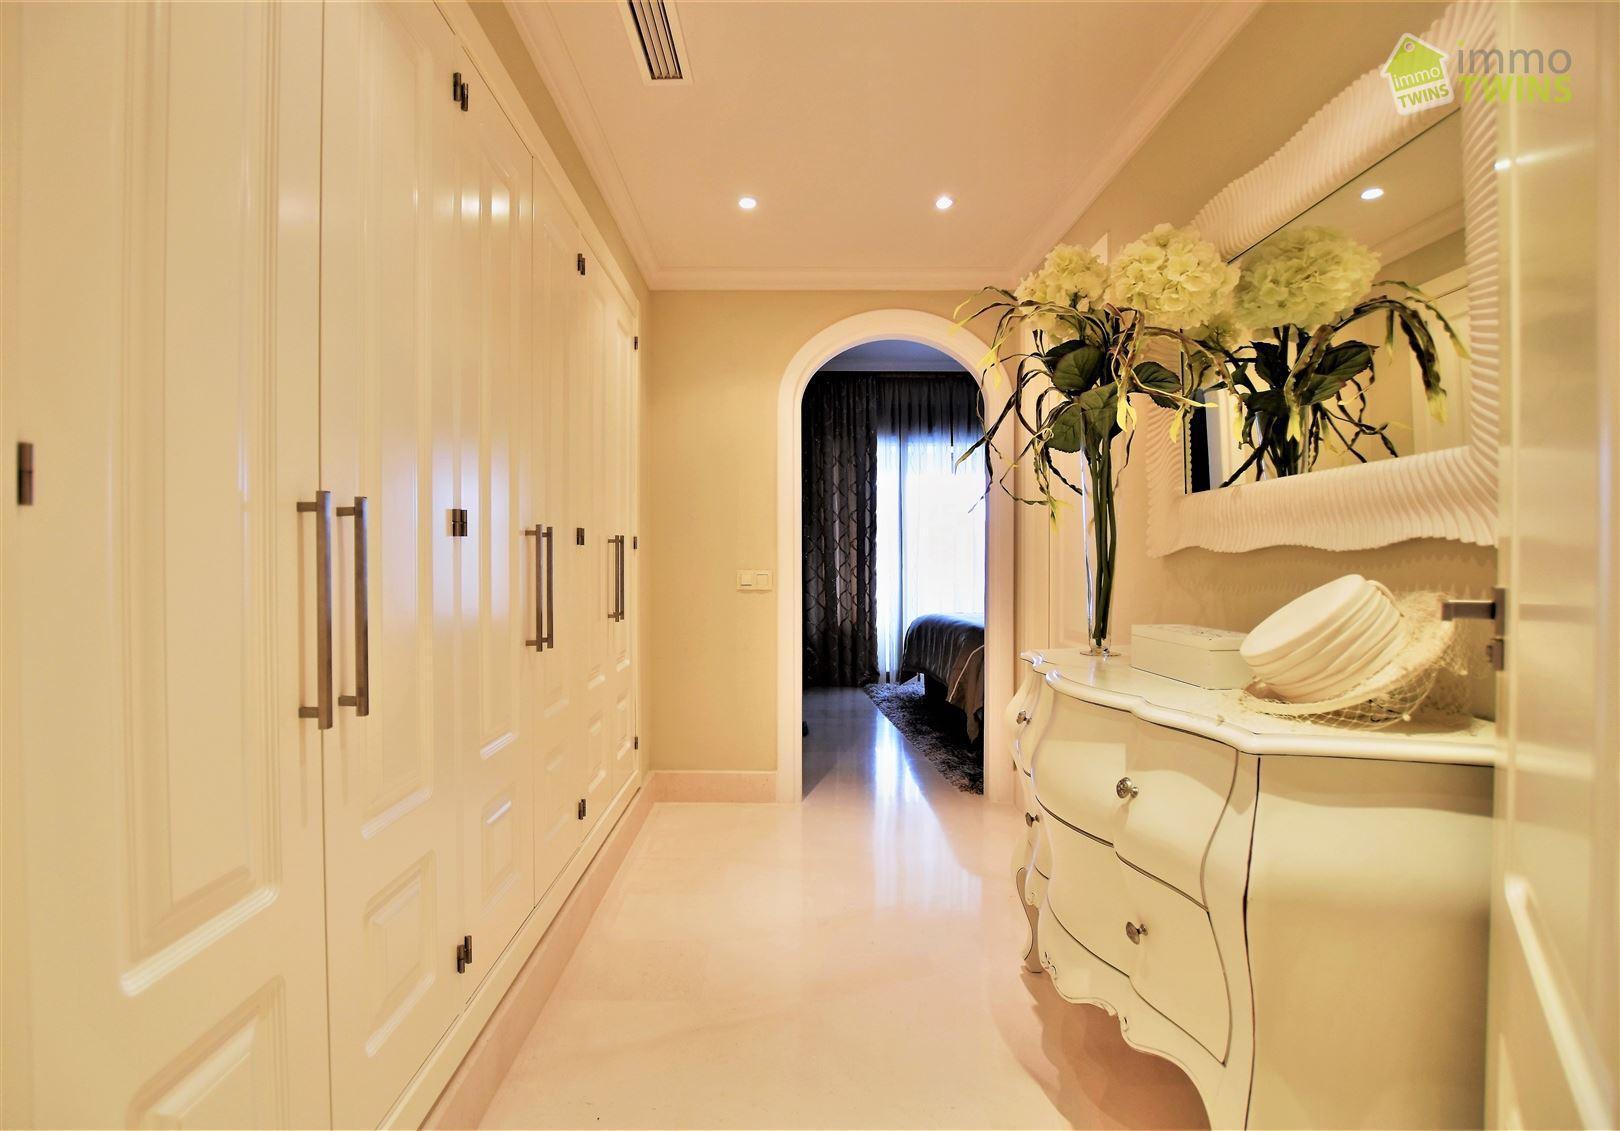 Foto 20 : Appartement te 29679 MARBELLA (Spanje) - Prijs € 485.000